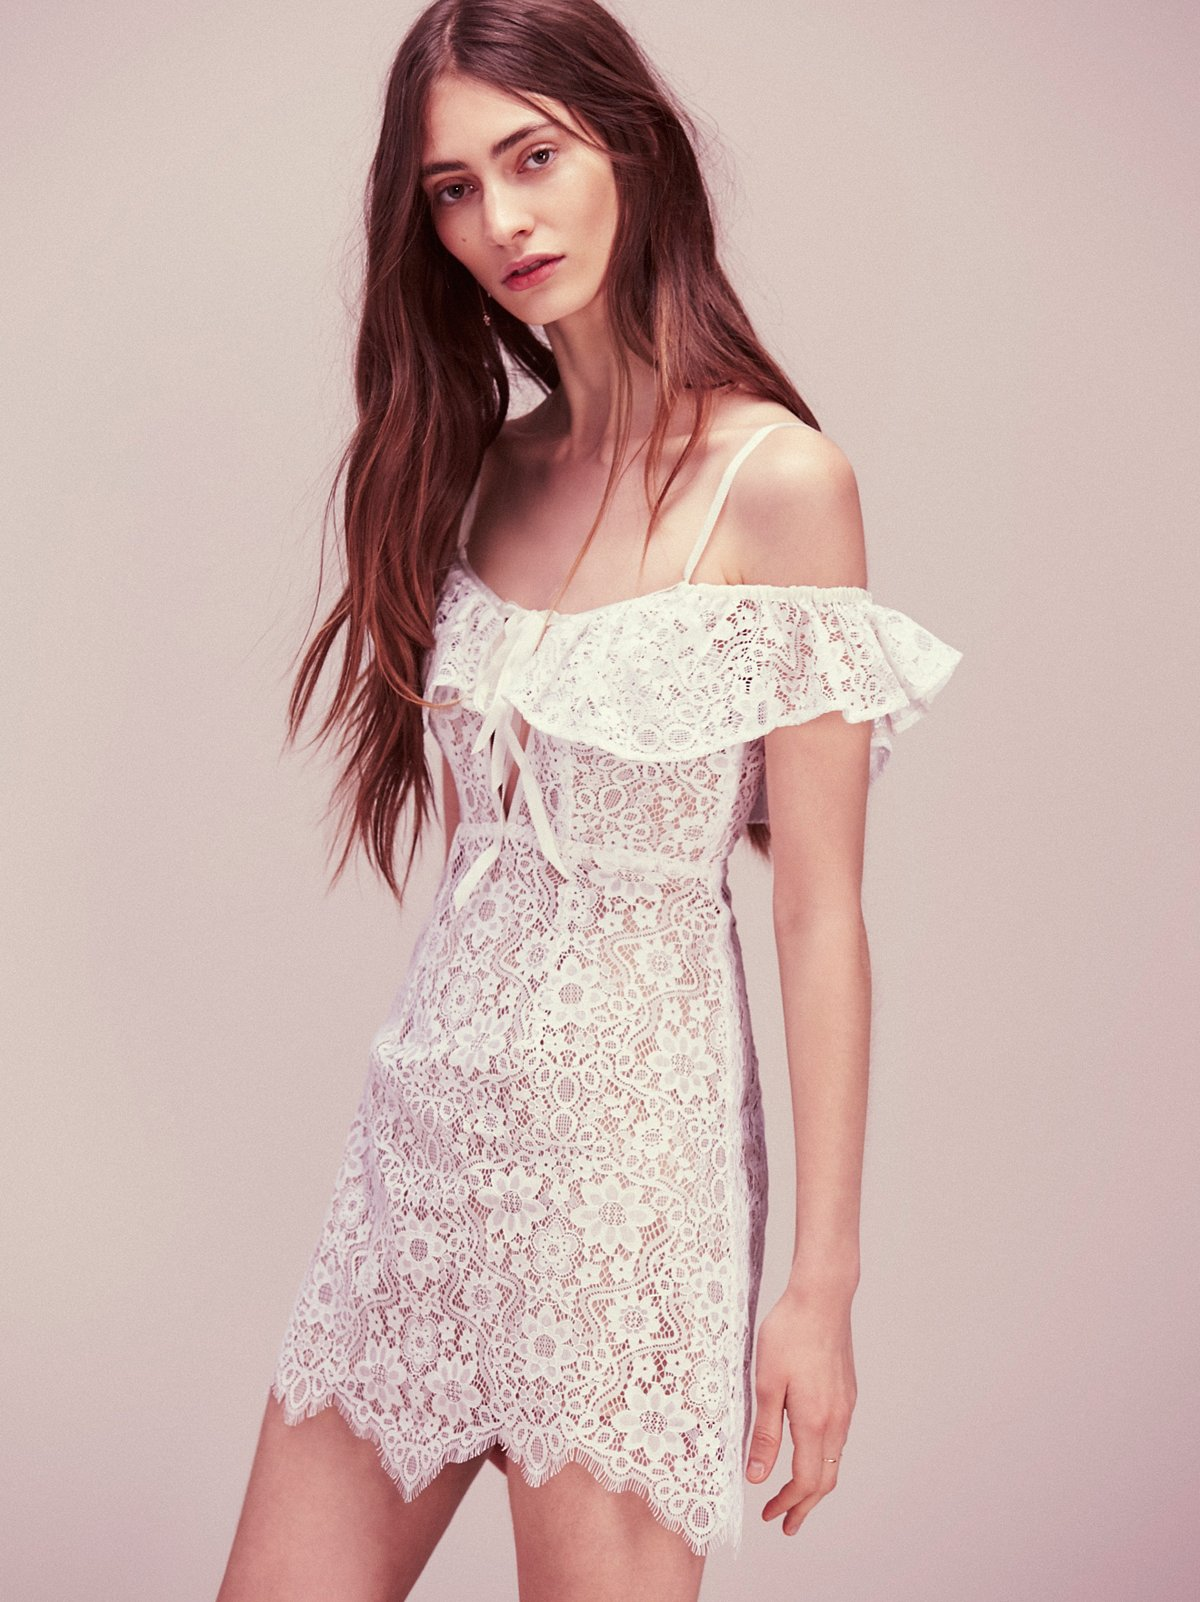 Rosemary连衣裙